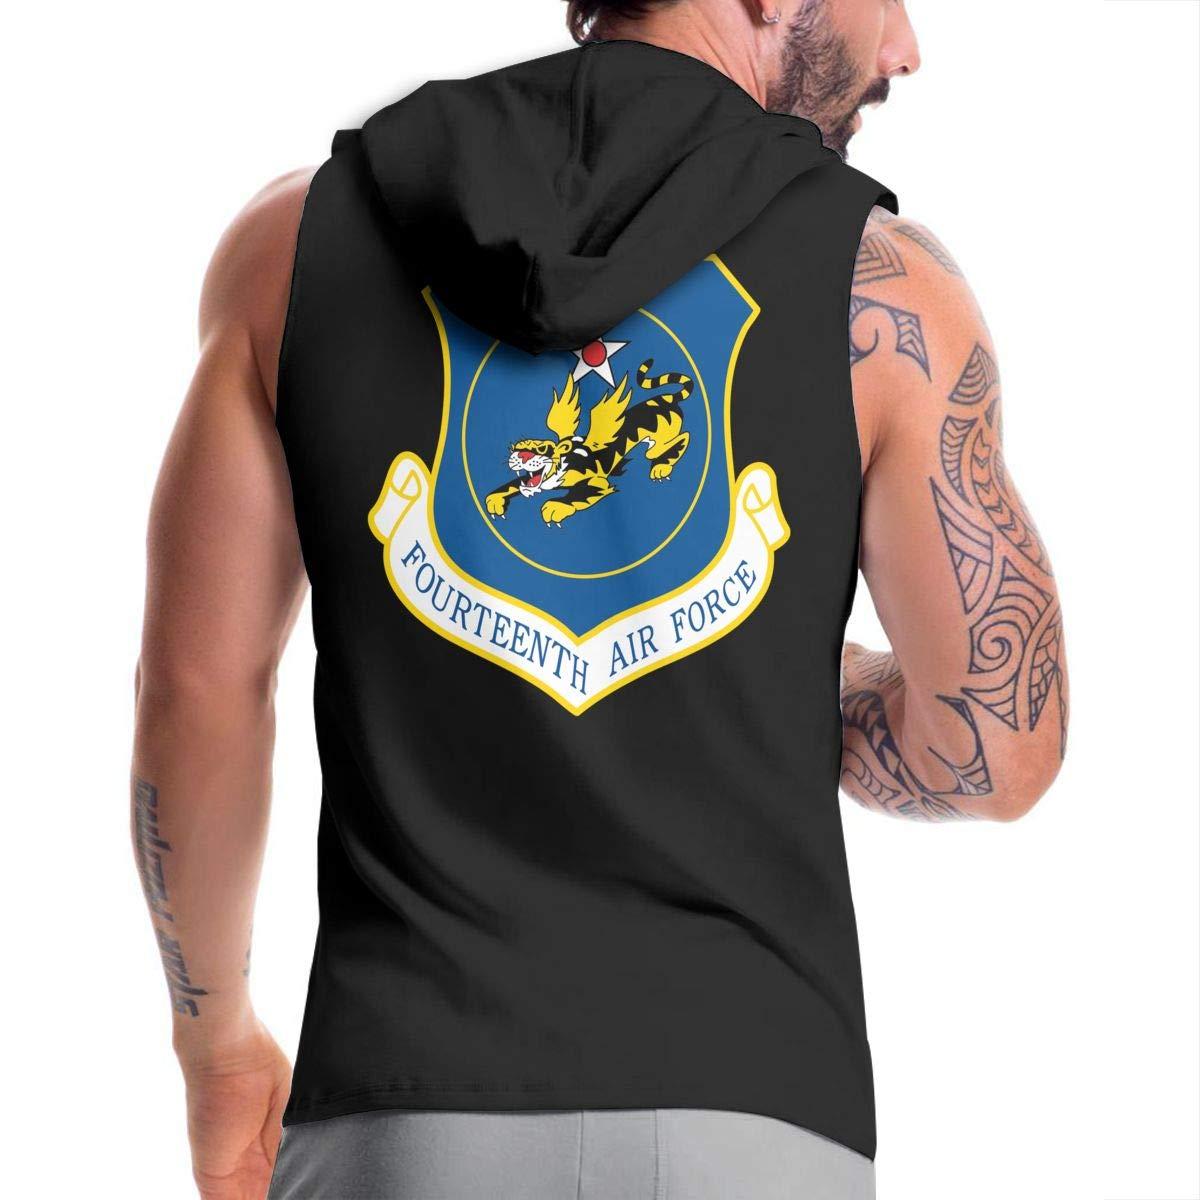 NMBOJR Fourteenth Air Force Mens Hipster Hip Hop Hoodies Shirts